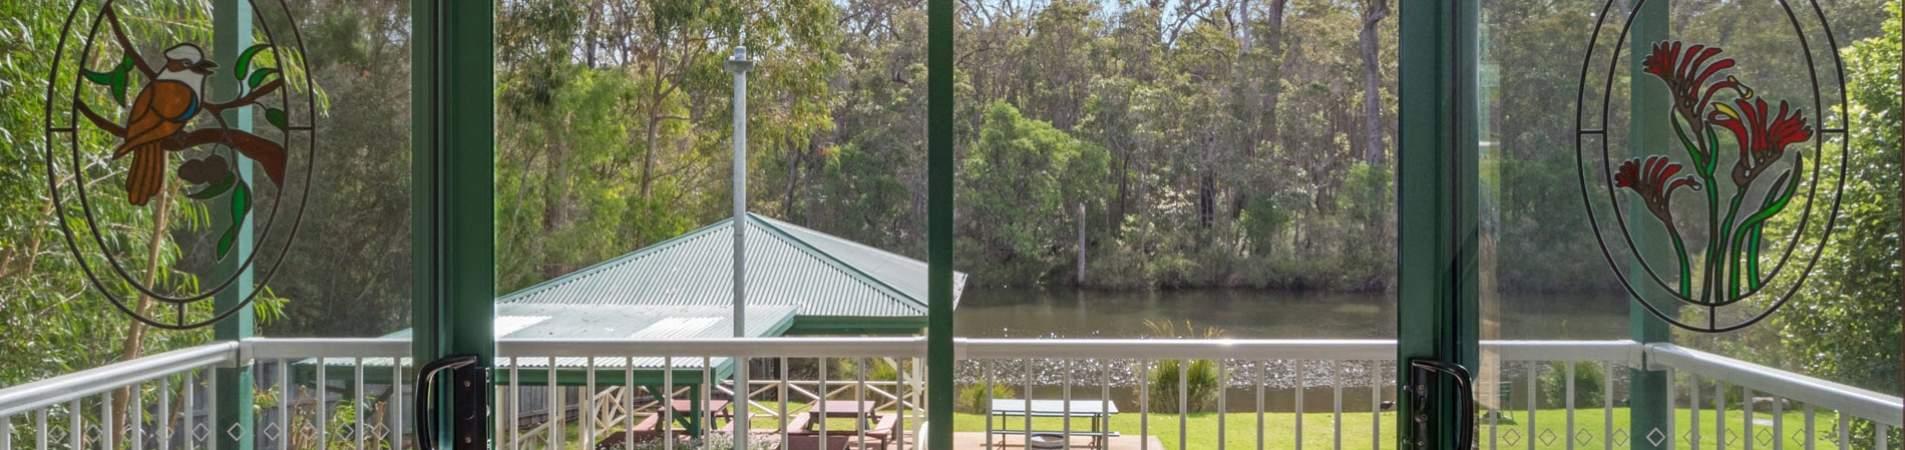 riverview tourist park margaret river accommodation - banner 4